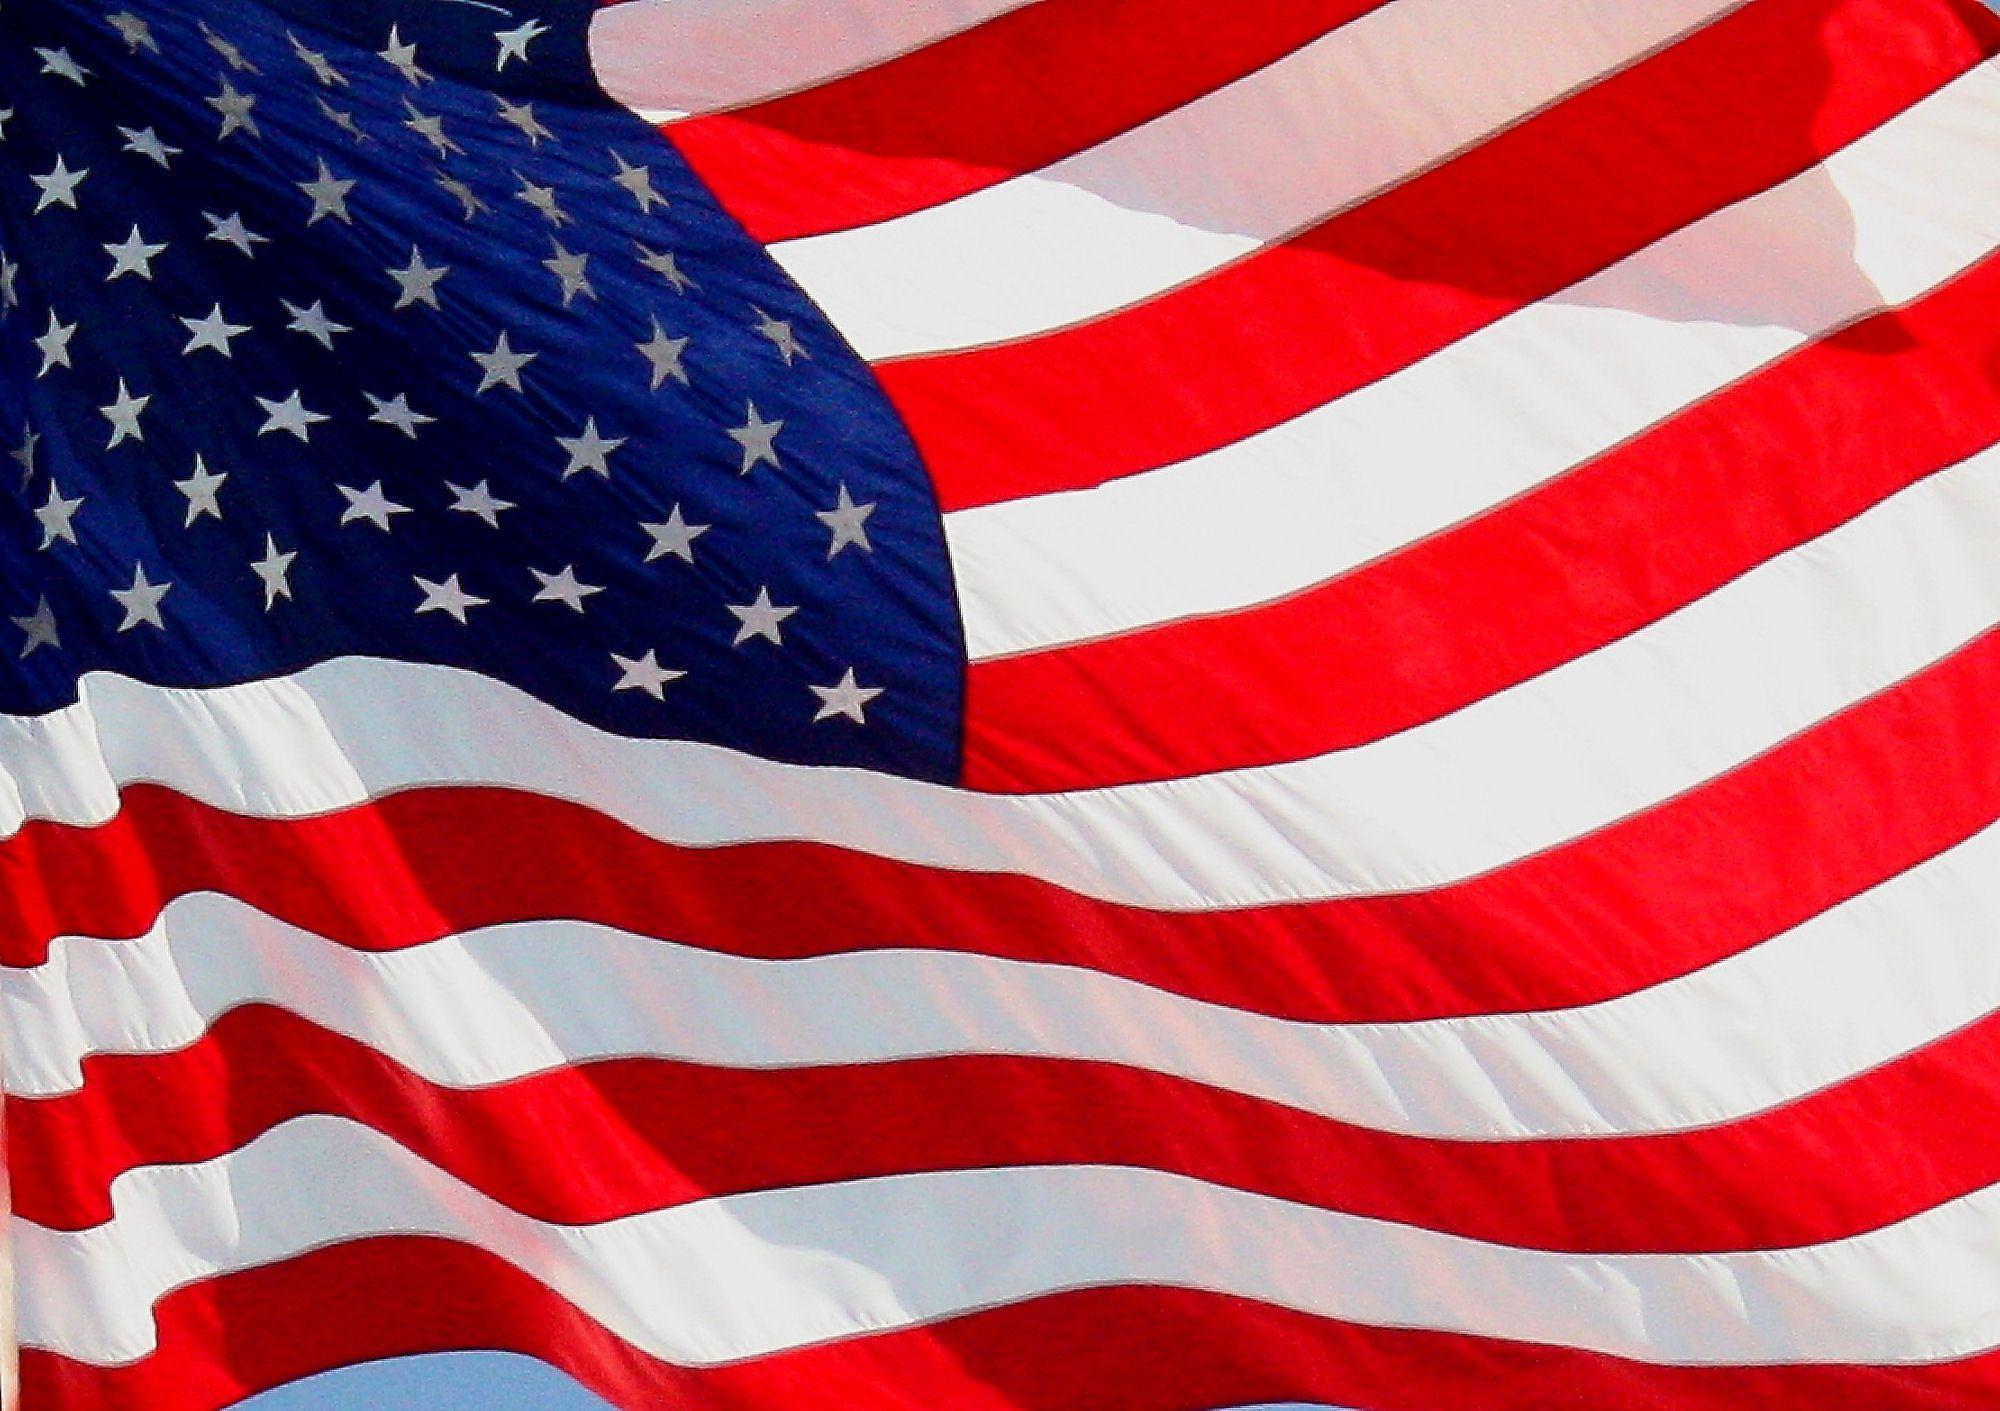 American Flag Background Hd American Flag Desktop ...